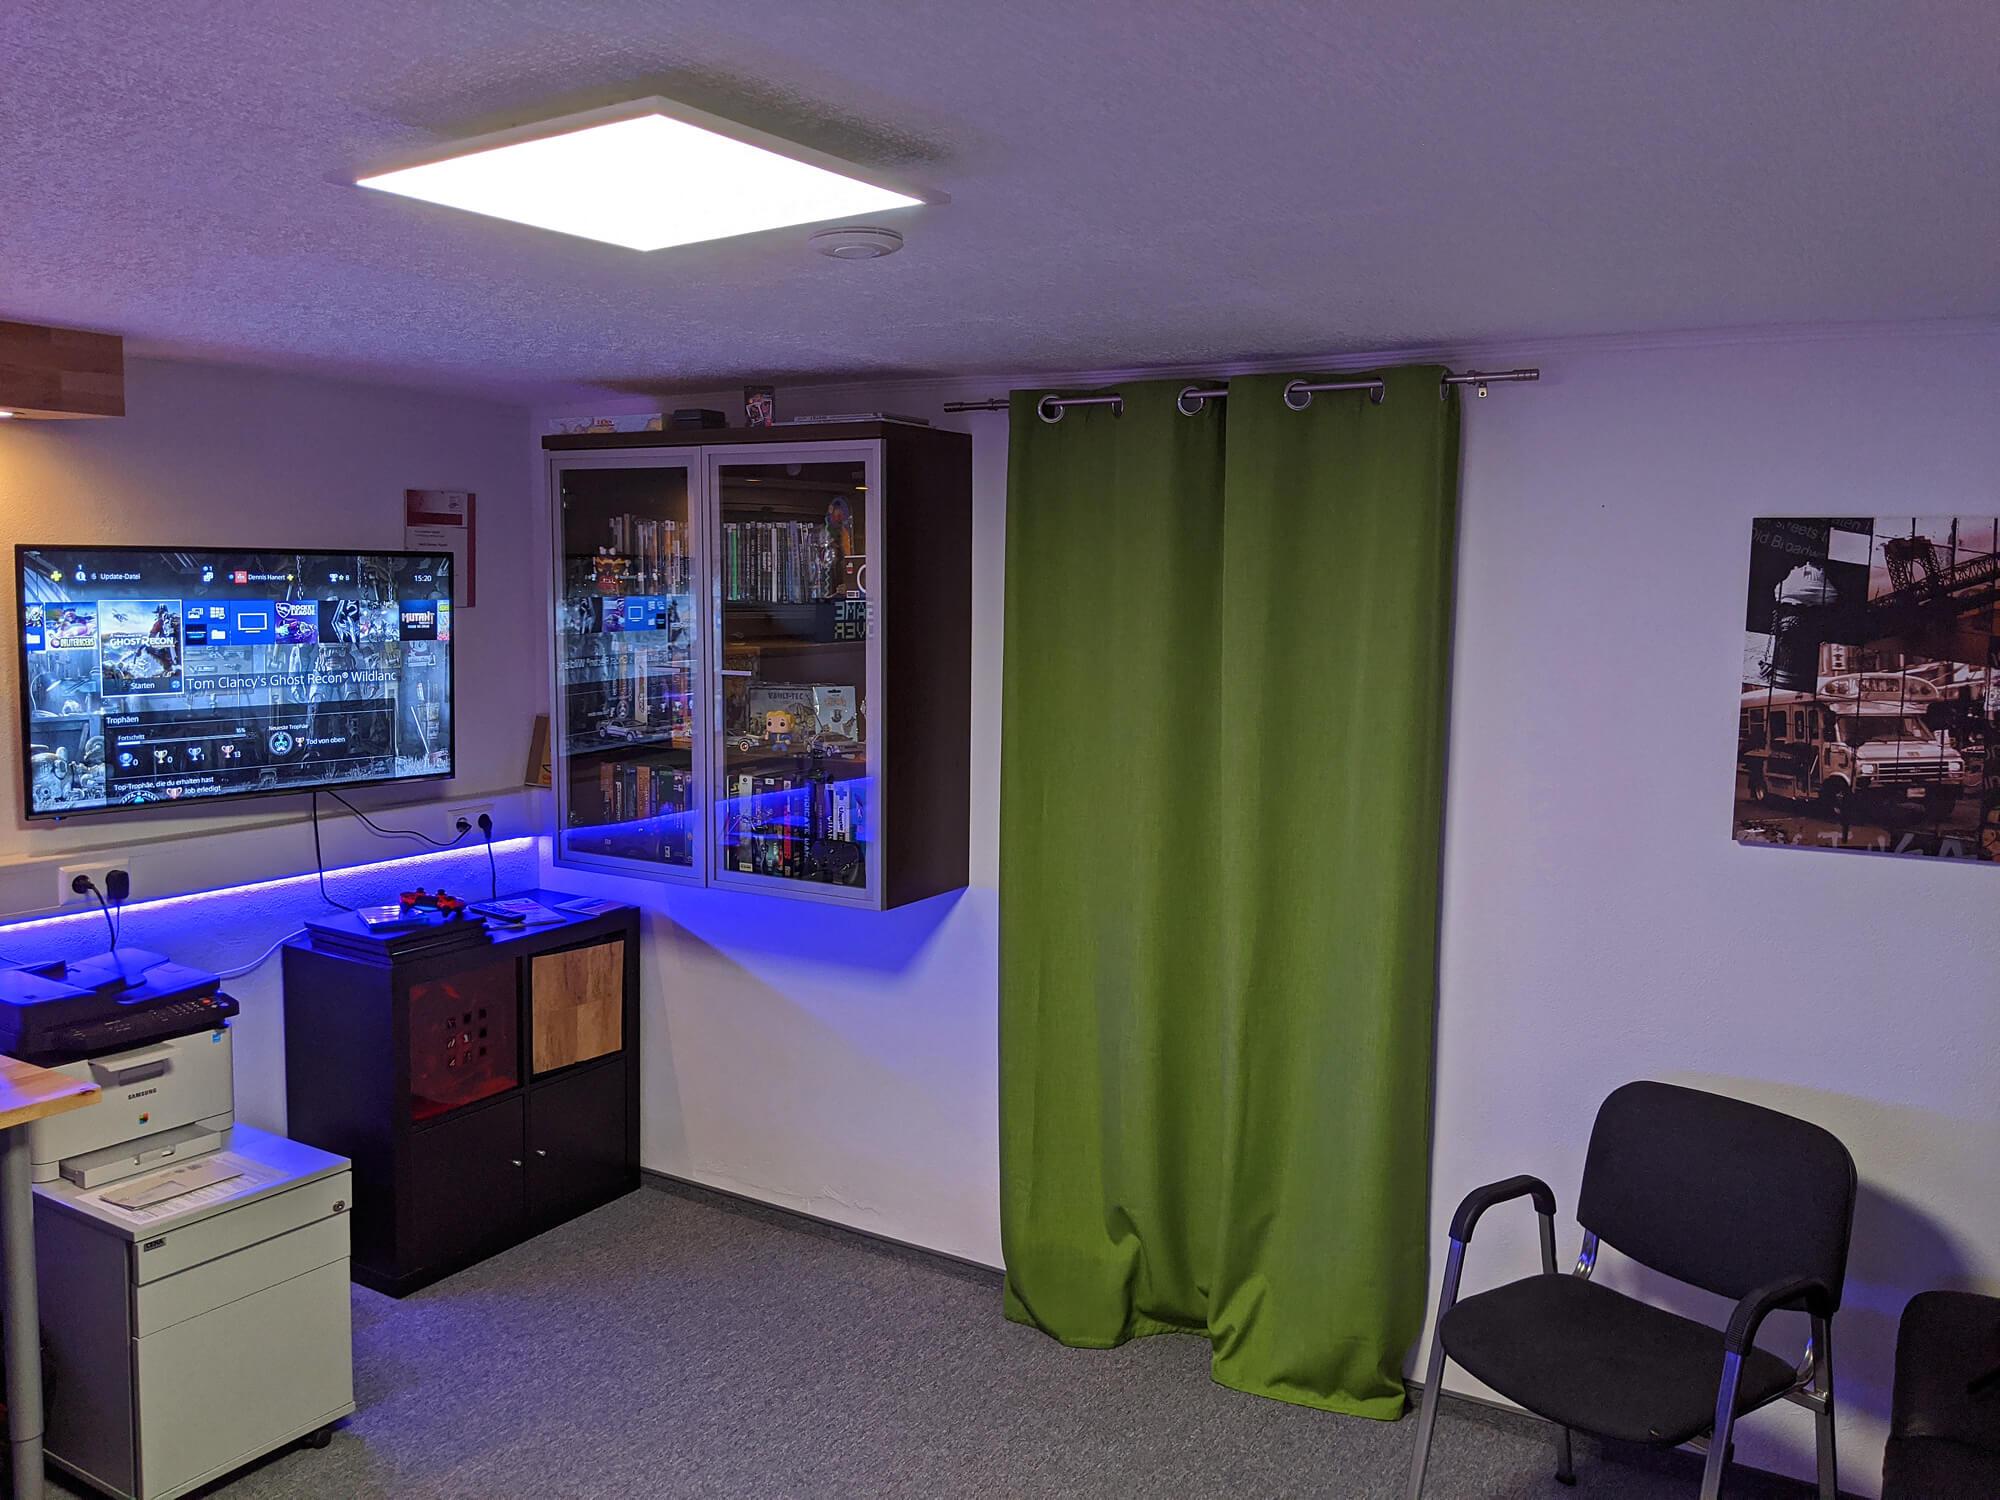 Gaming Room 22 - Ergebnis 2